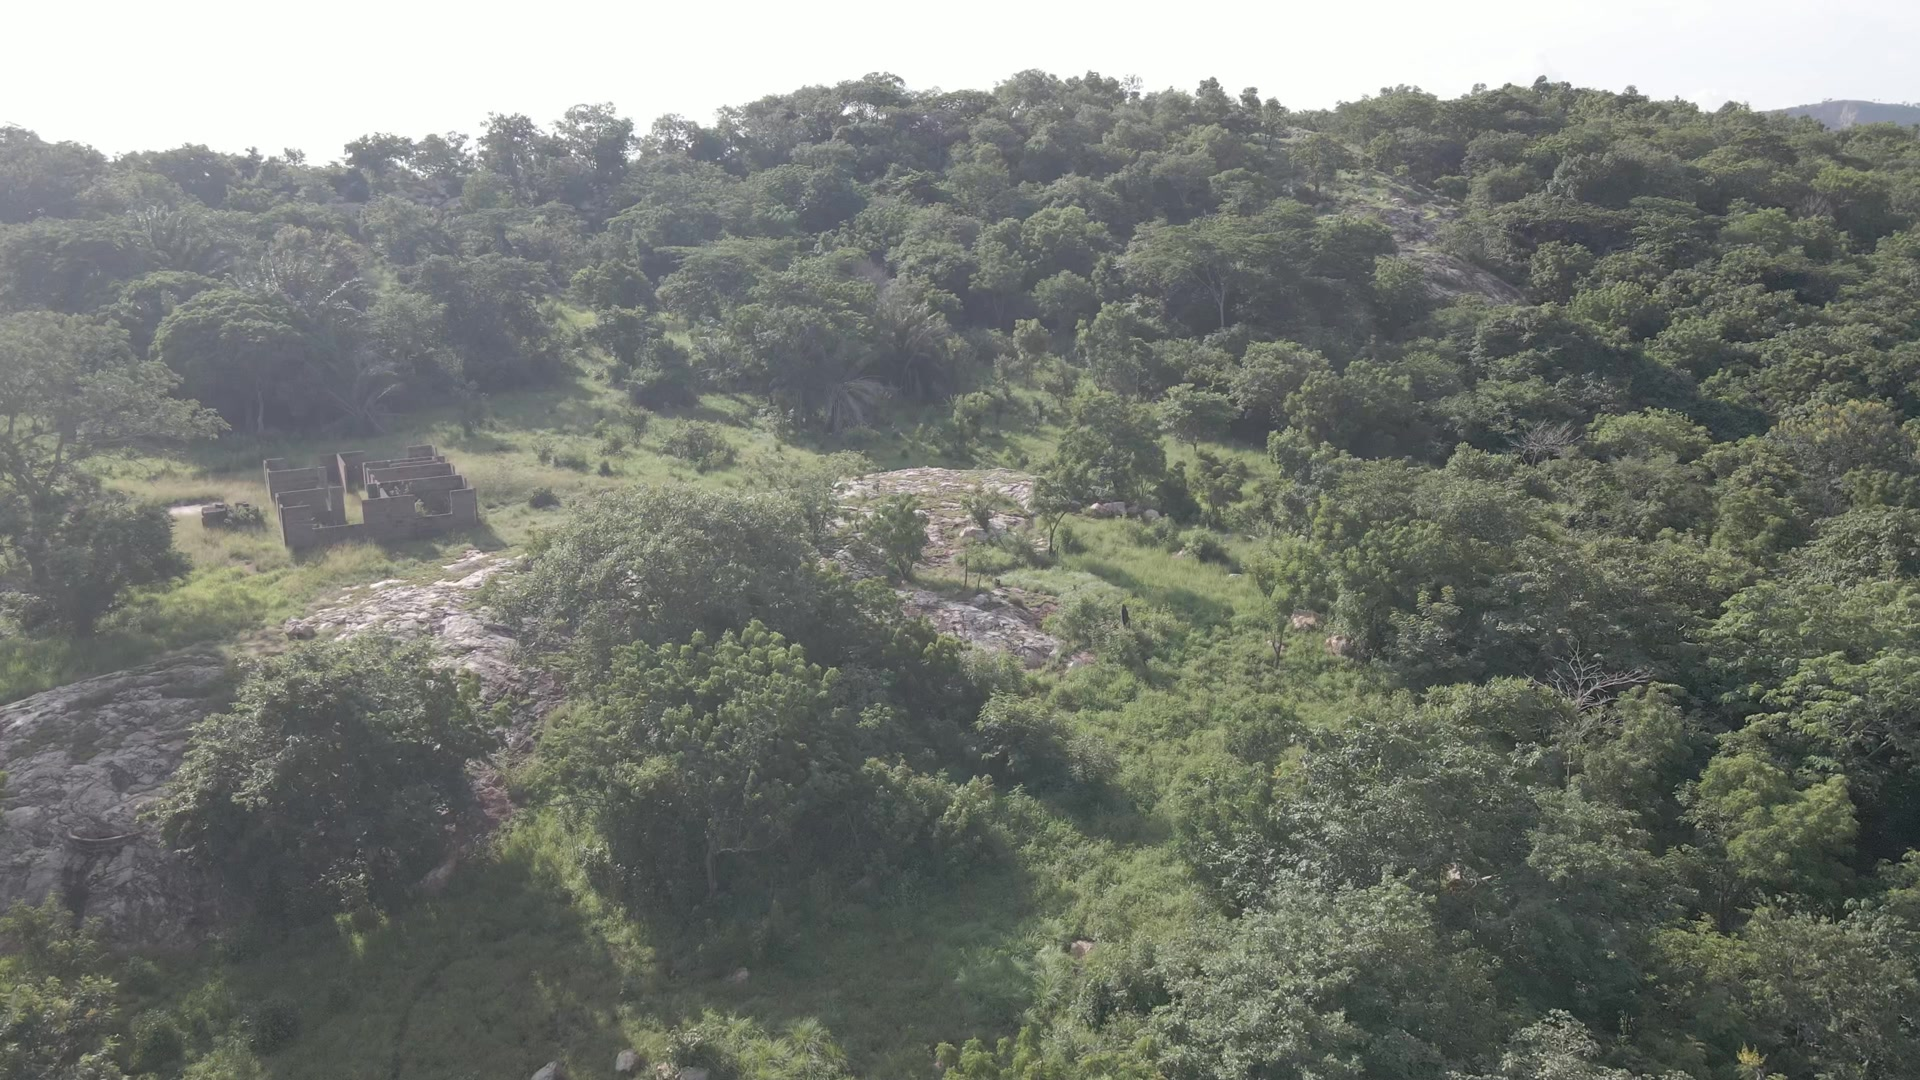 Fly Over Hill Reveal River Vegetation